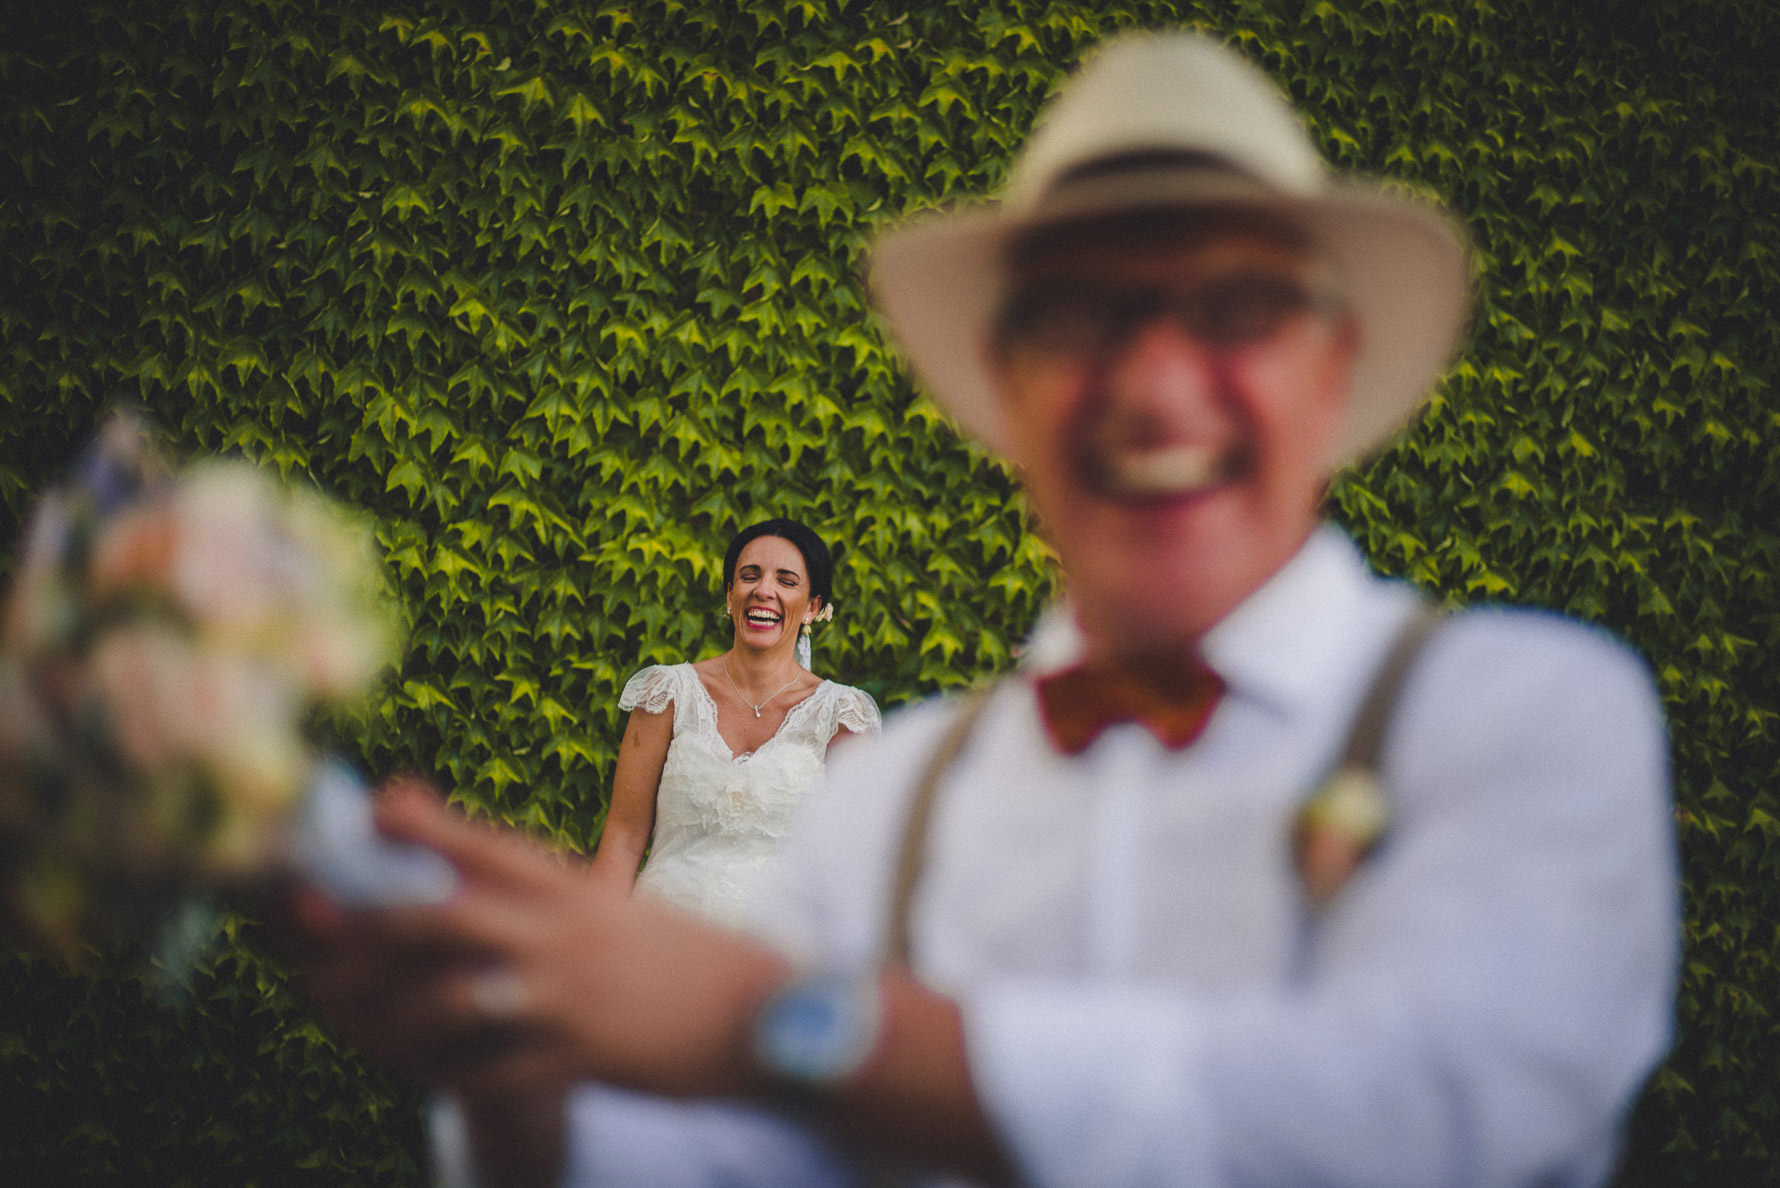 fotografo-siena-matrimonio-senza-pose